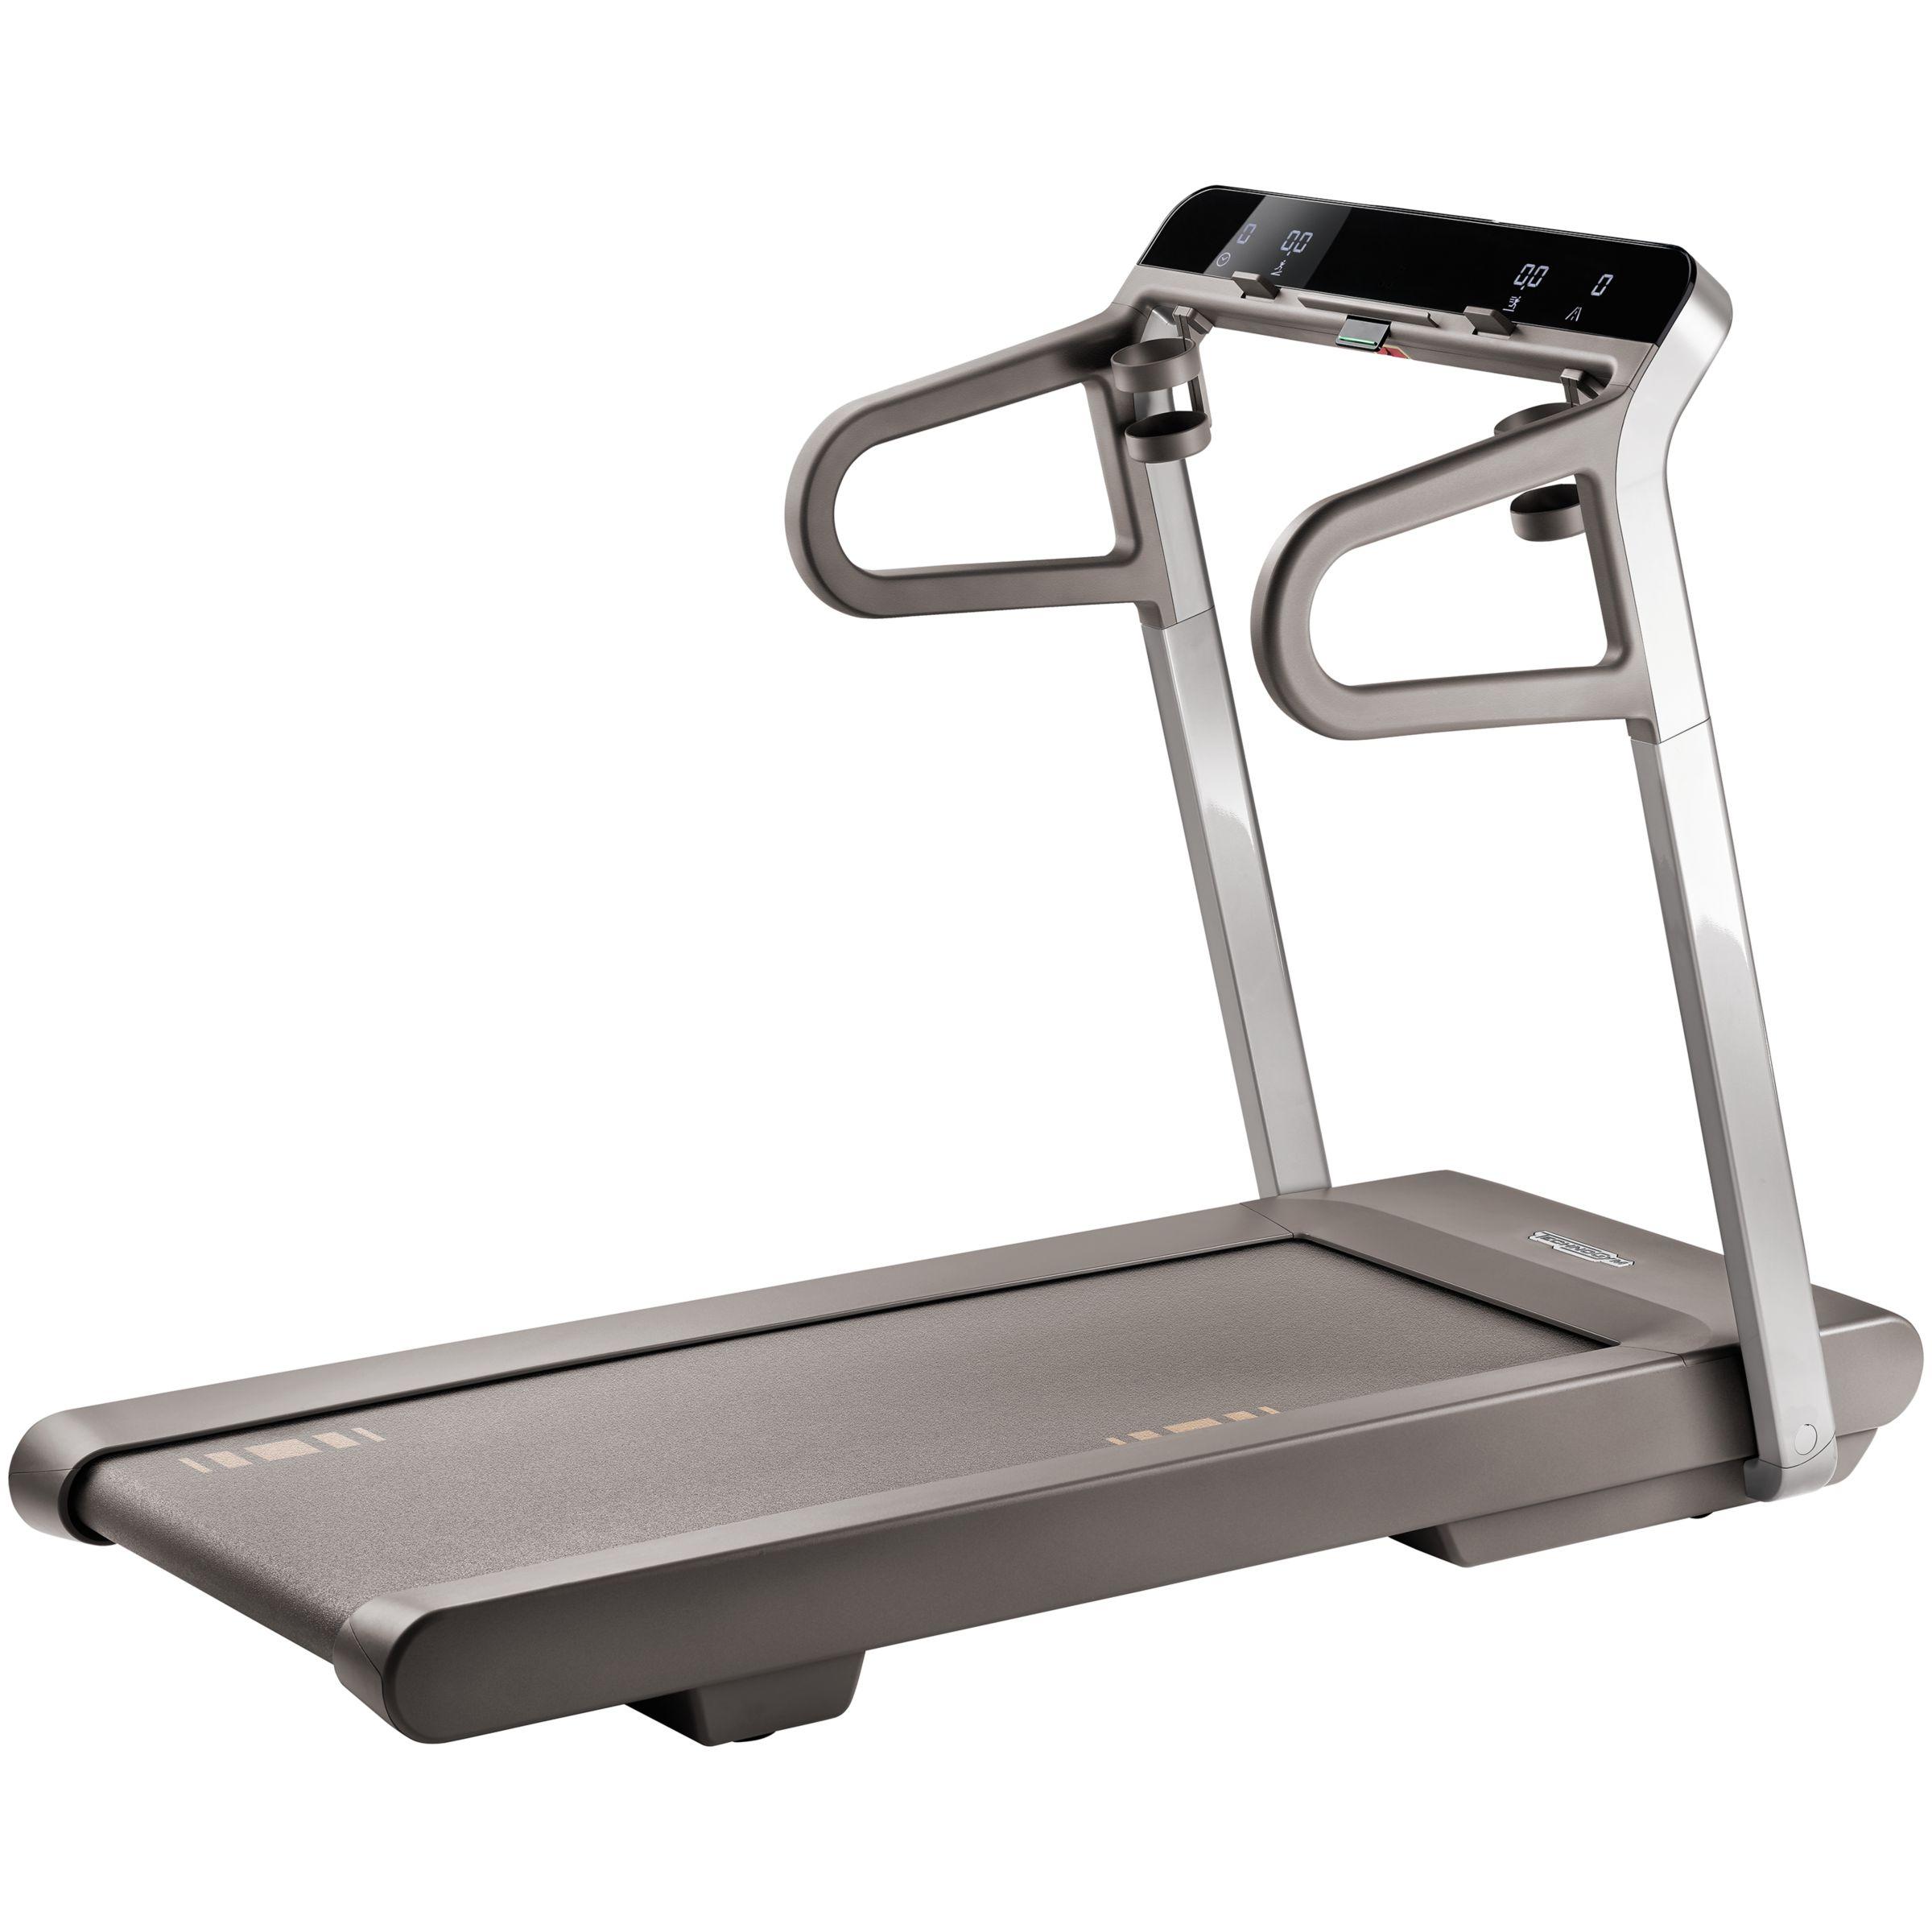 Technogym MYRUN Technogym Treadmill, Stone Grey